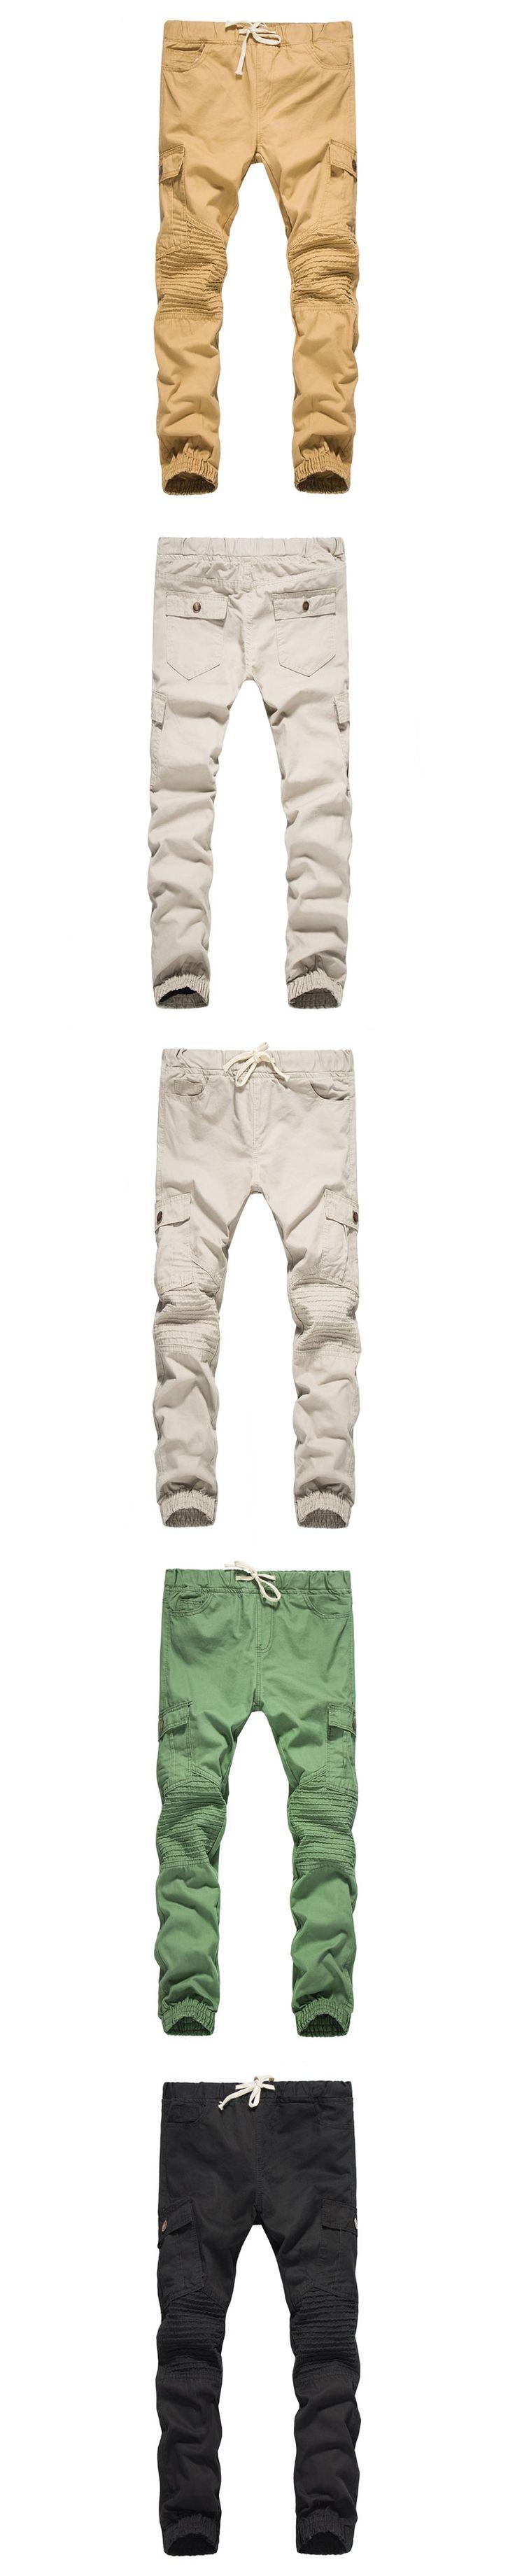 Brand Male New Fashion 2017 Slim Cotton Shredded Shirt Side Bag Wrinkle Pants Casual Pants Man Trousers Designer Mens Joggers